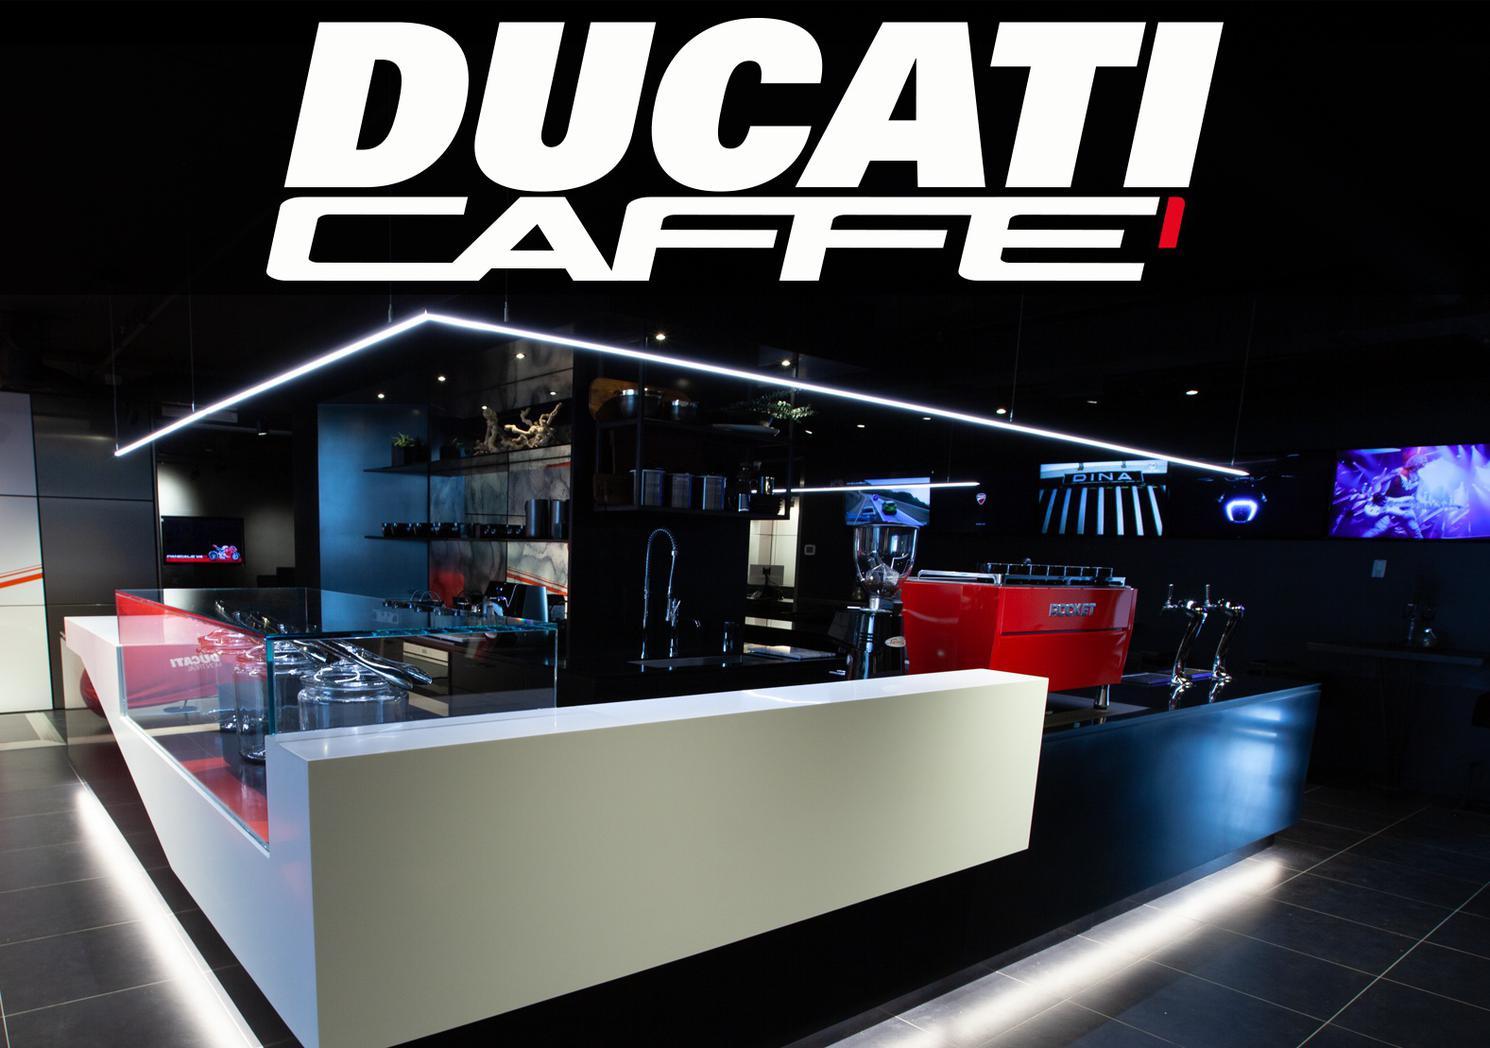 2018 Ducati Multistrada 1260 S Touring - Frais inclus+Taxes